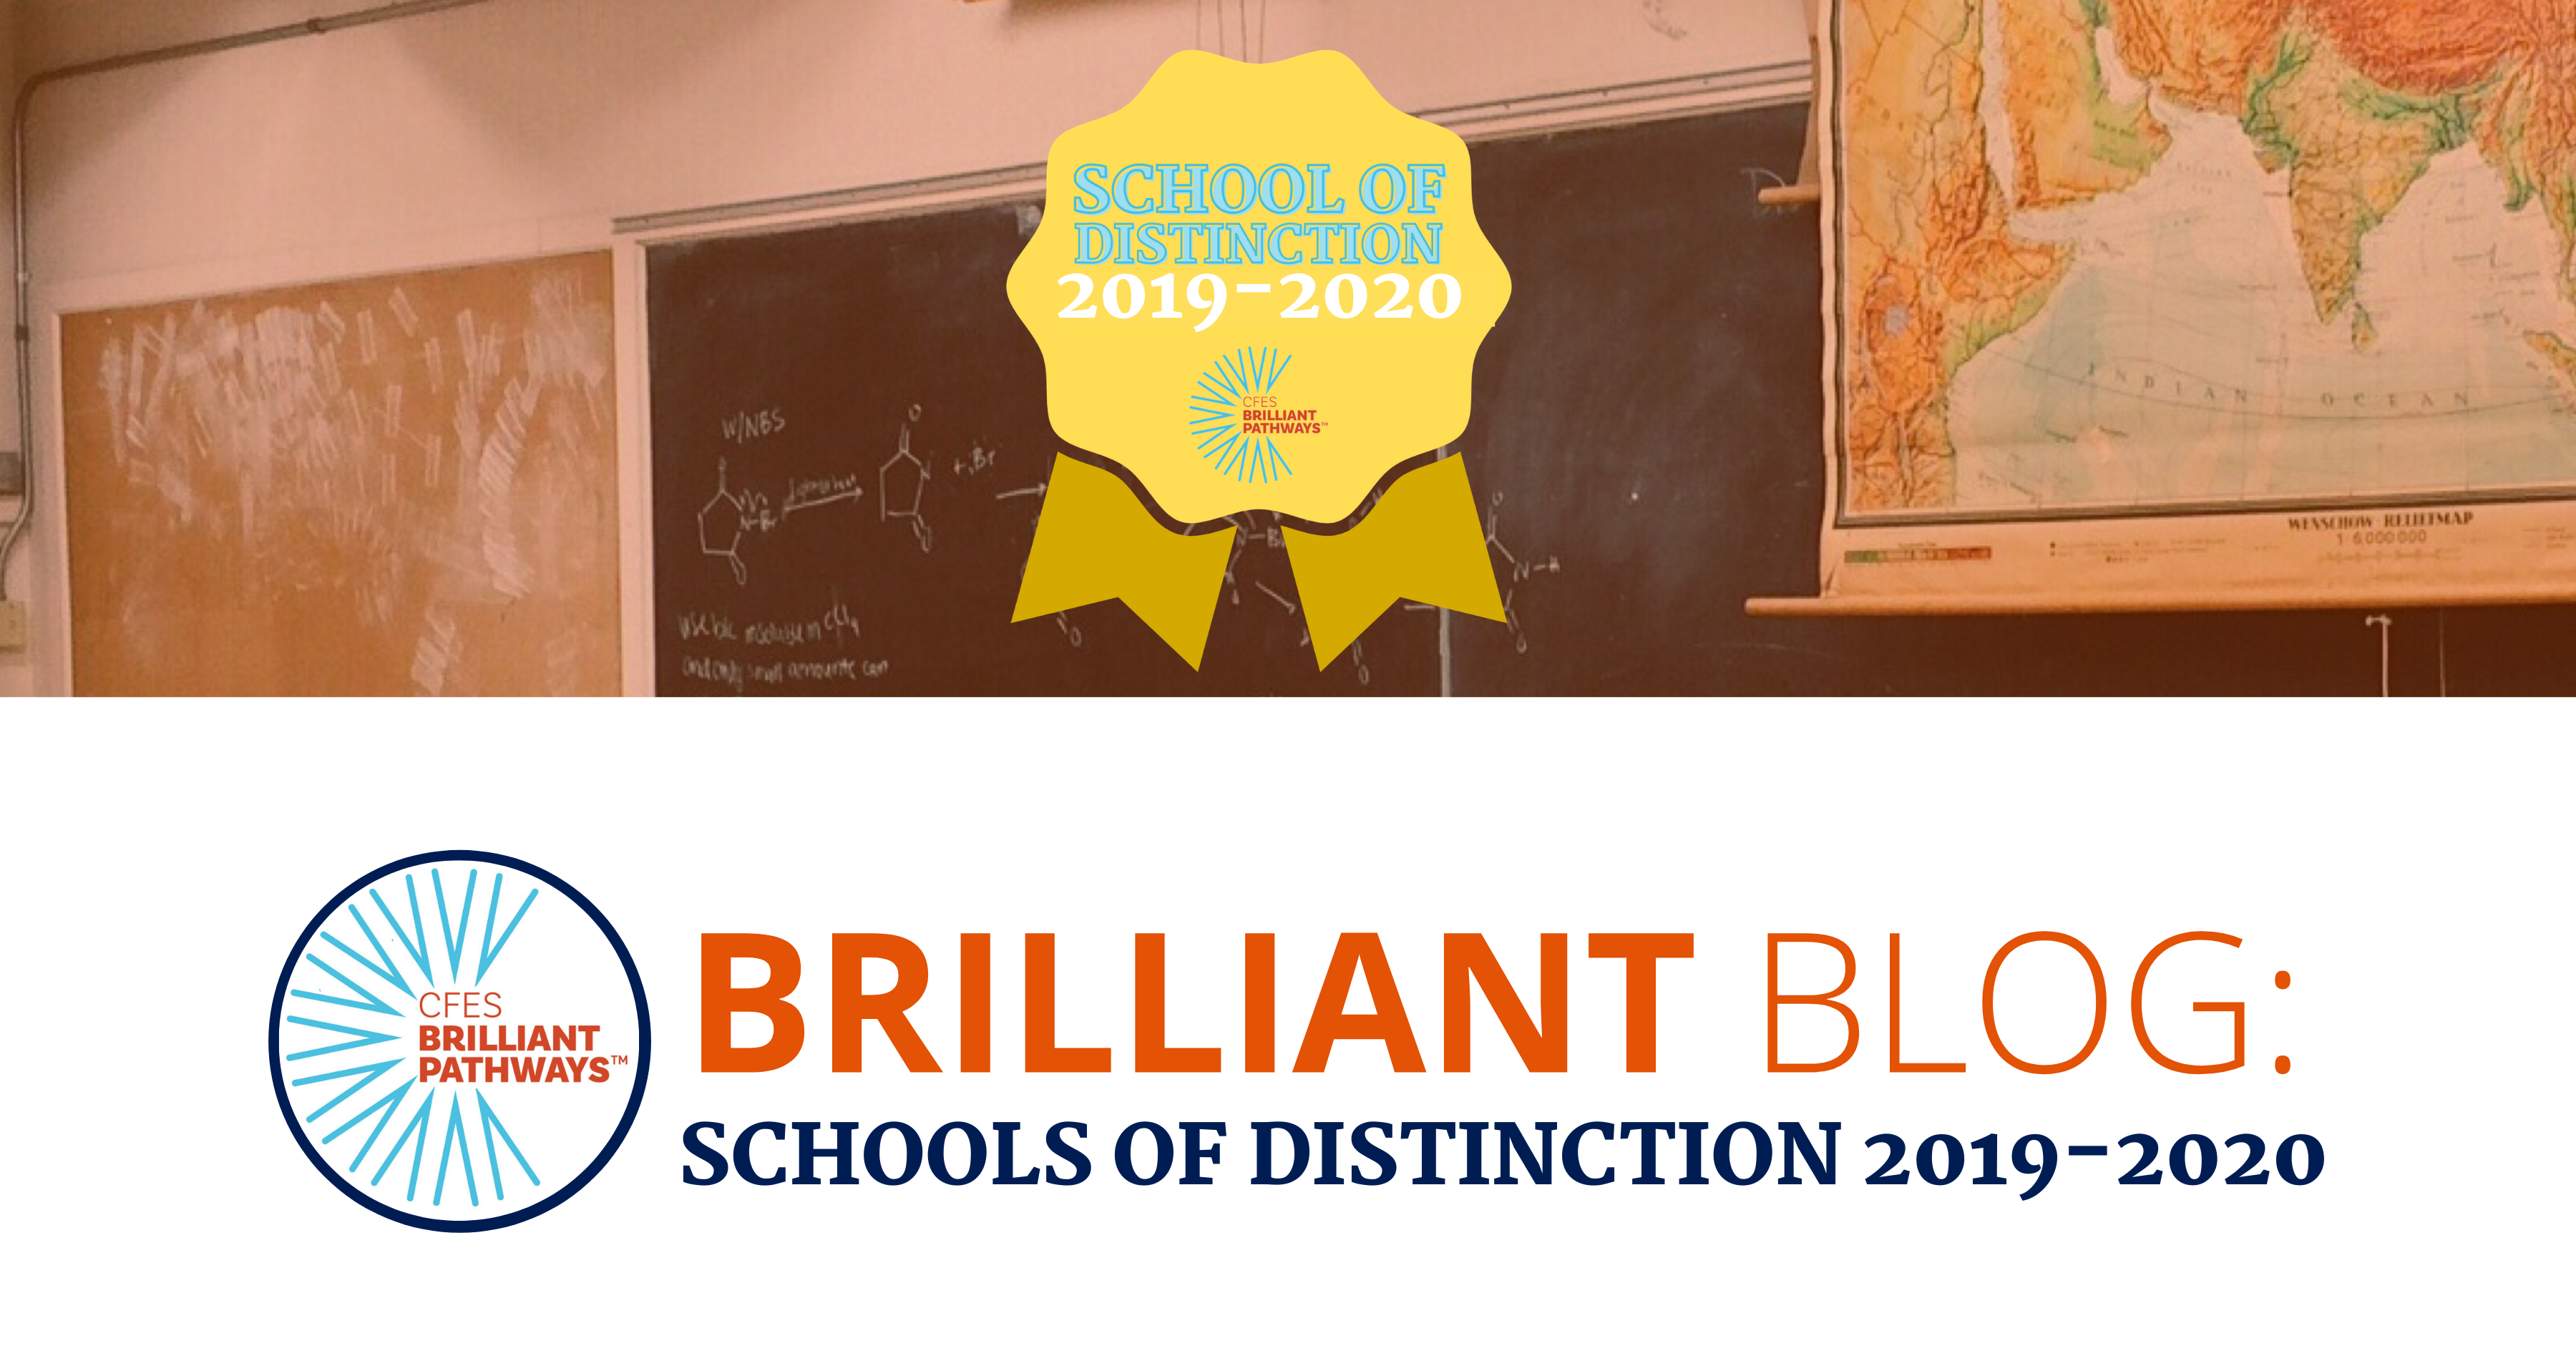 Schools of Distinction blog 2019-2020